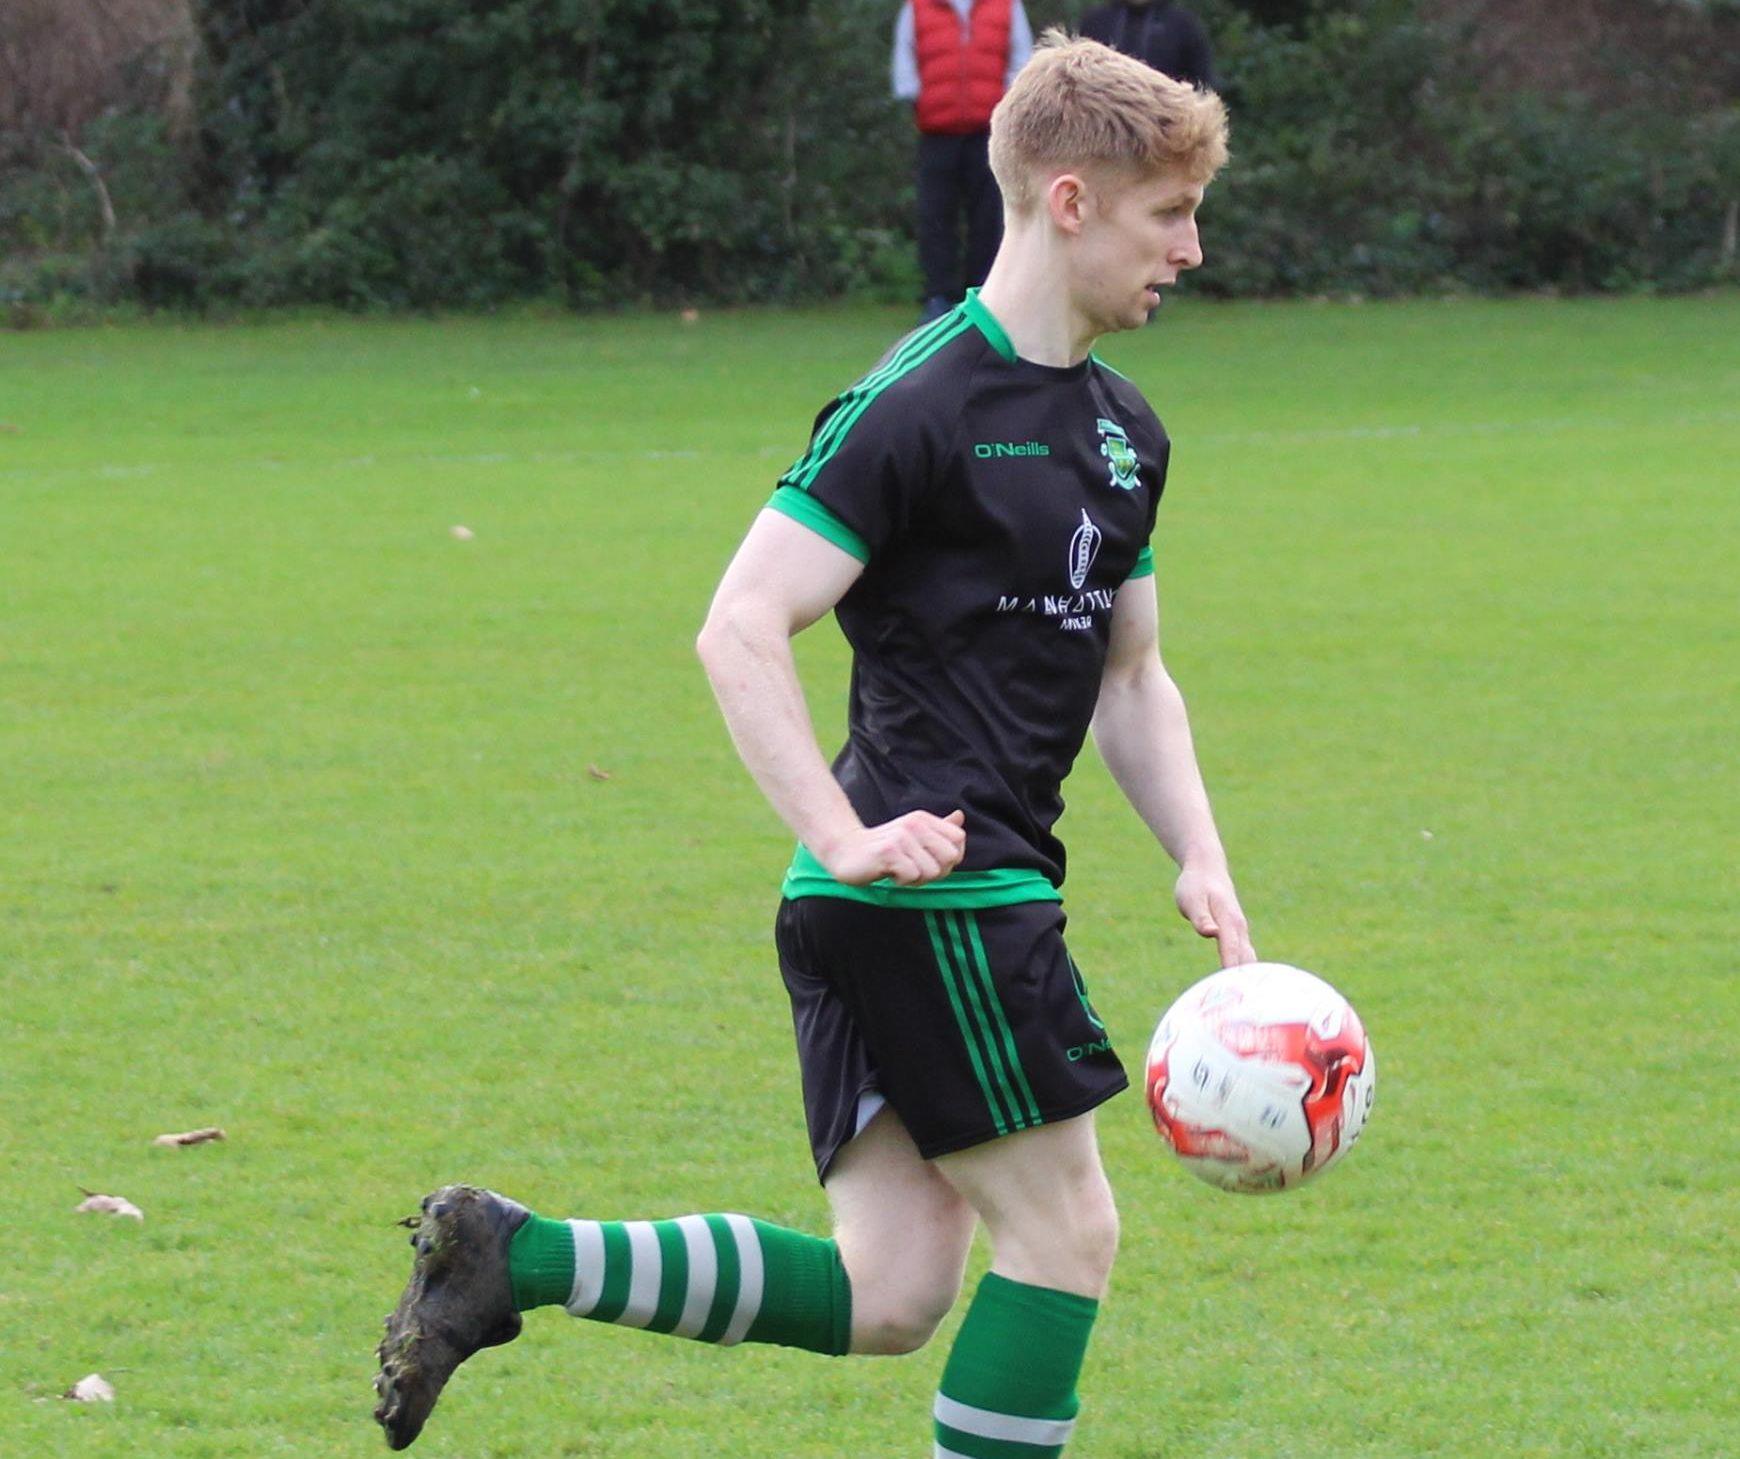 Eoghan White of Portlaoise AFC